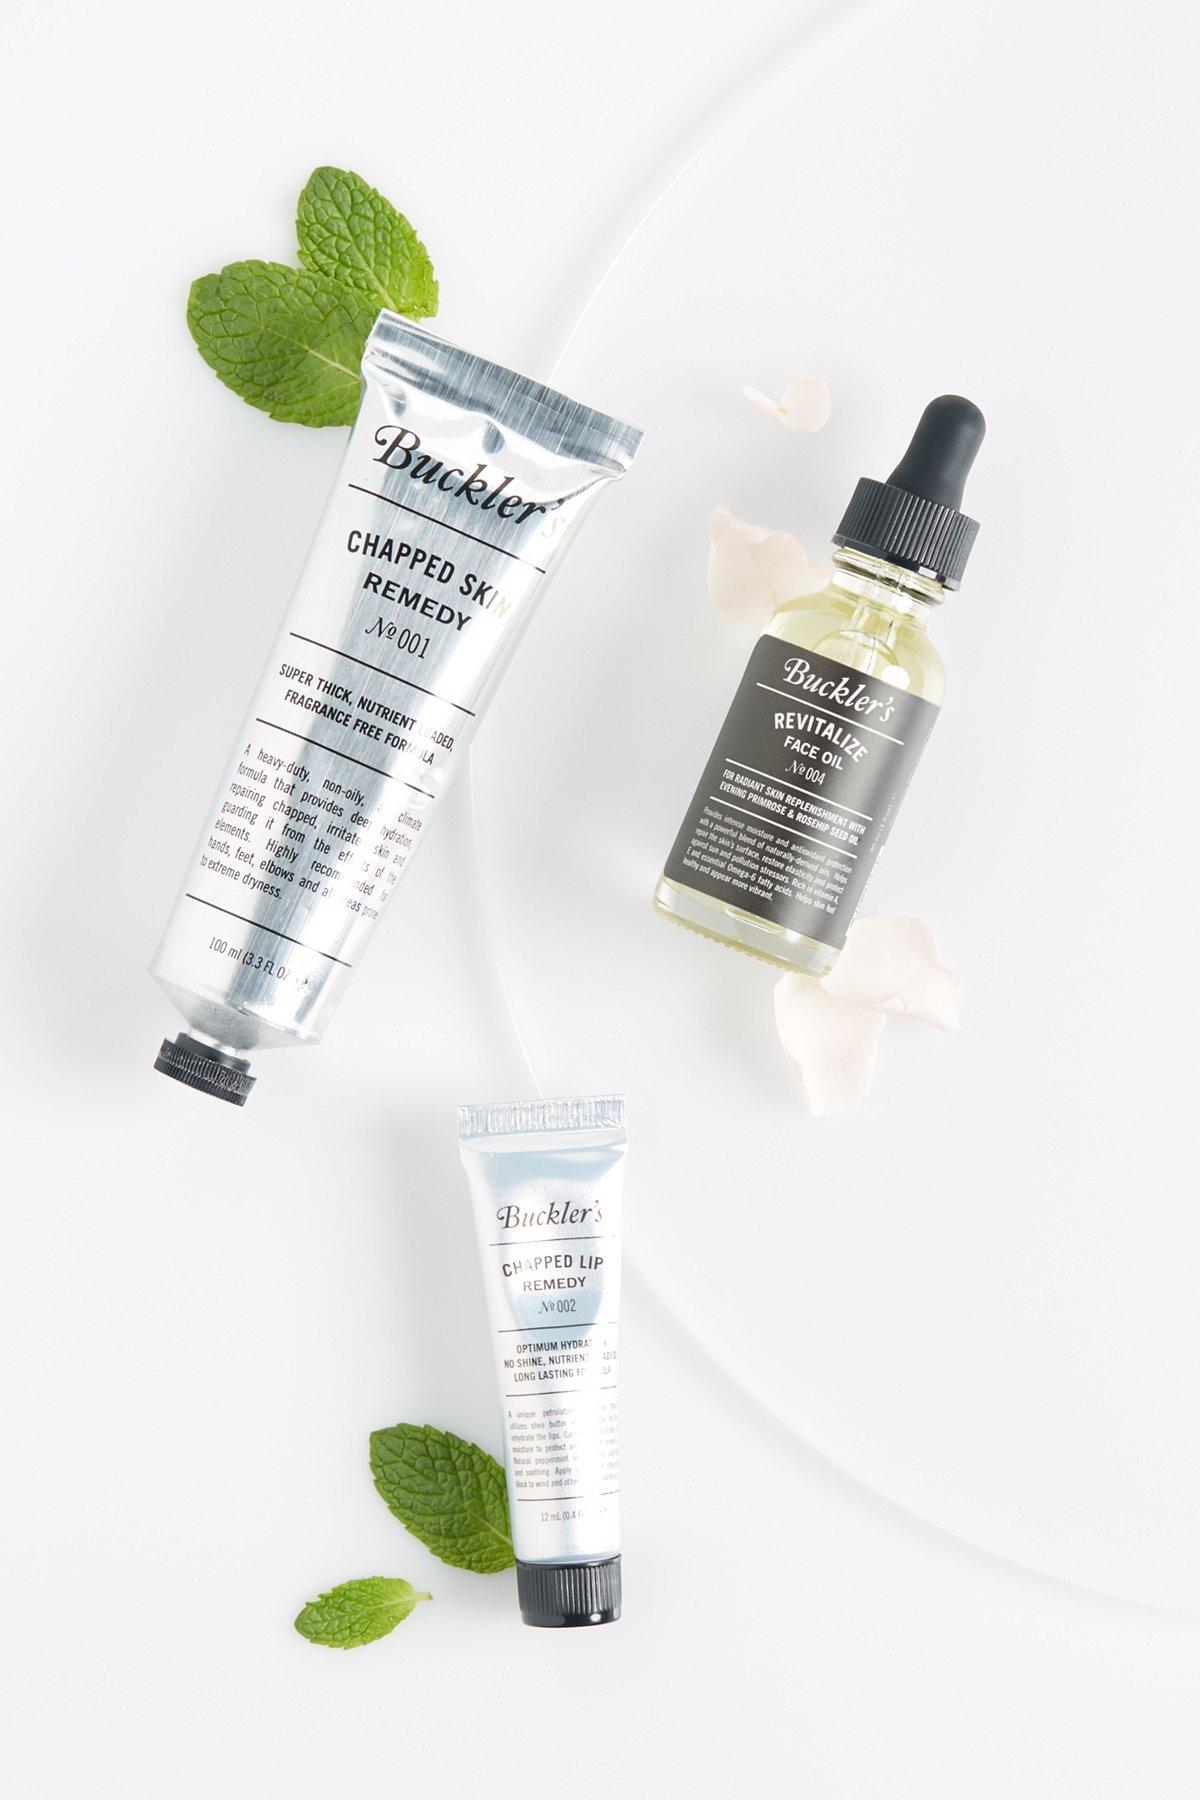 Buckler's Ultimate Skin Hydration Kit